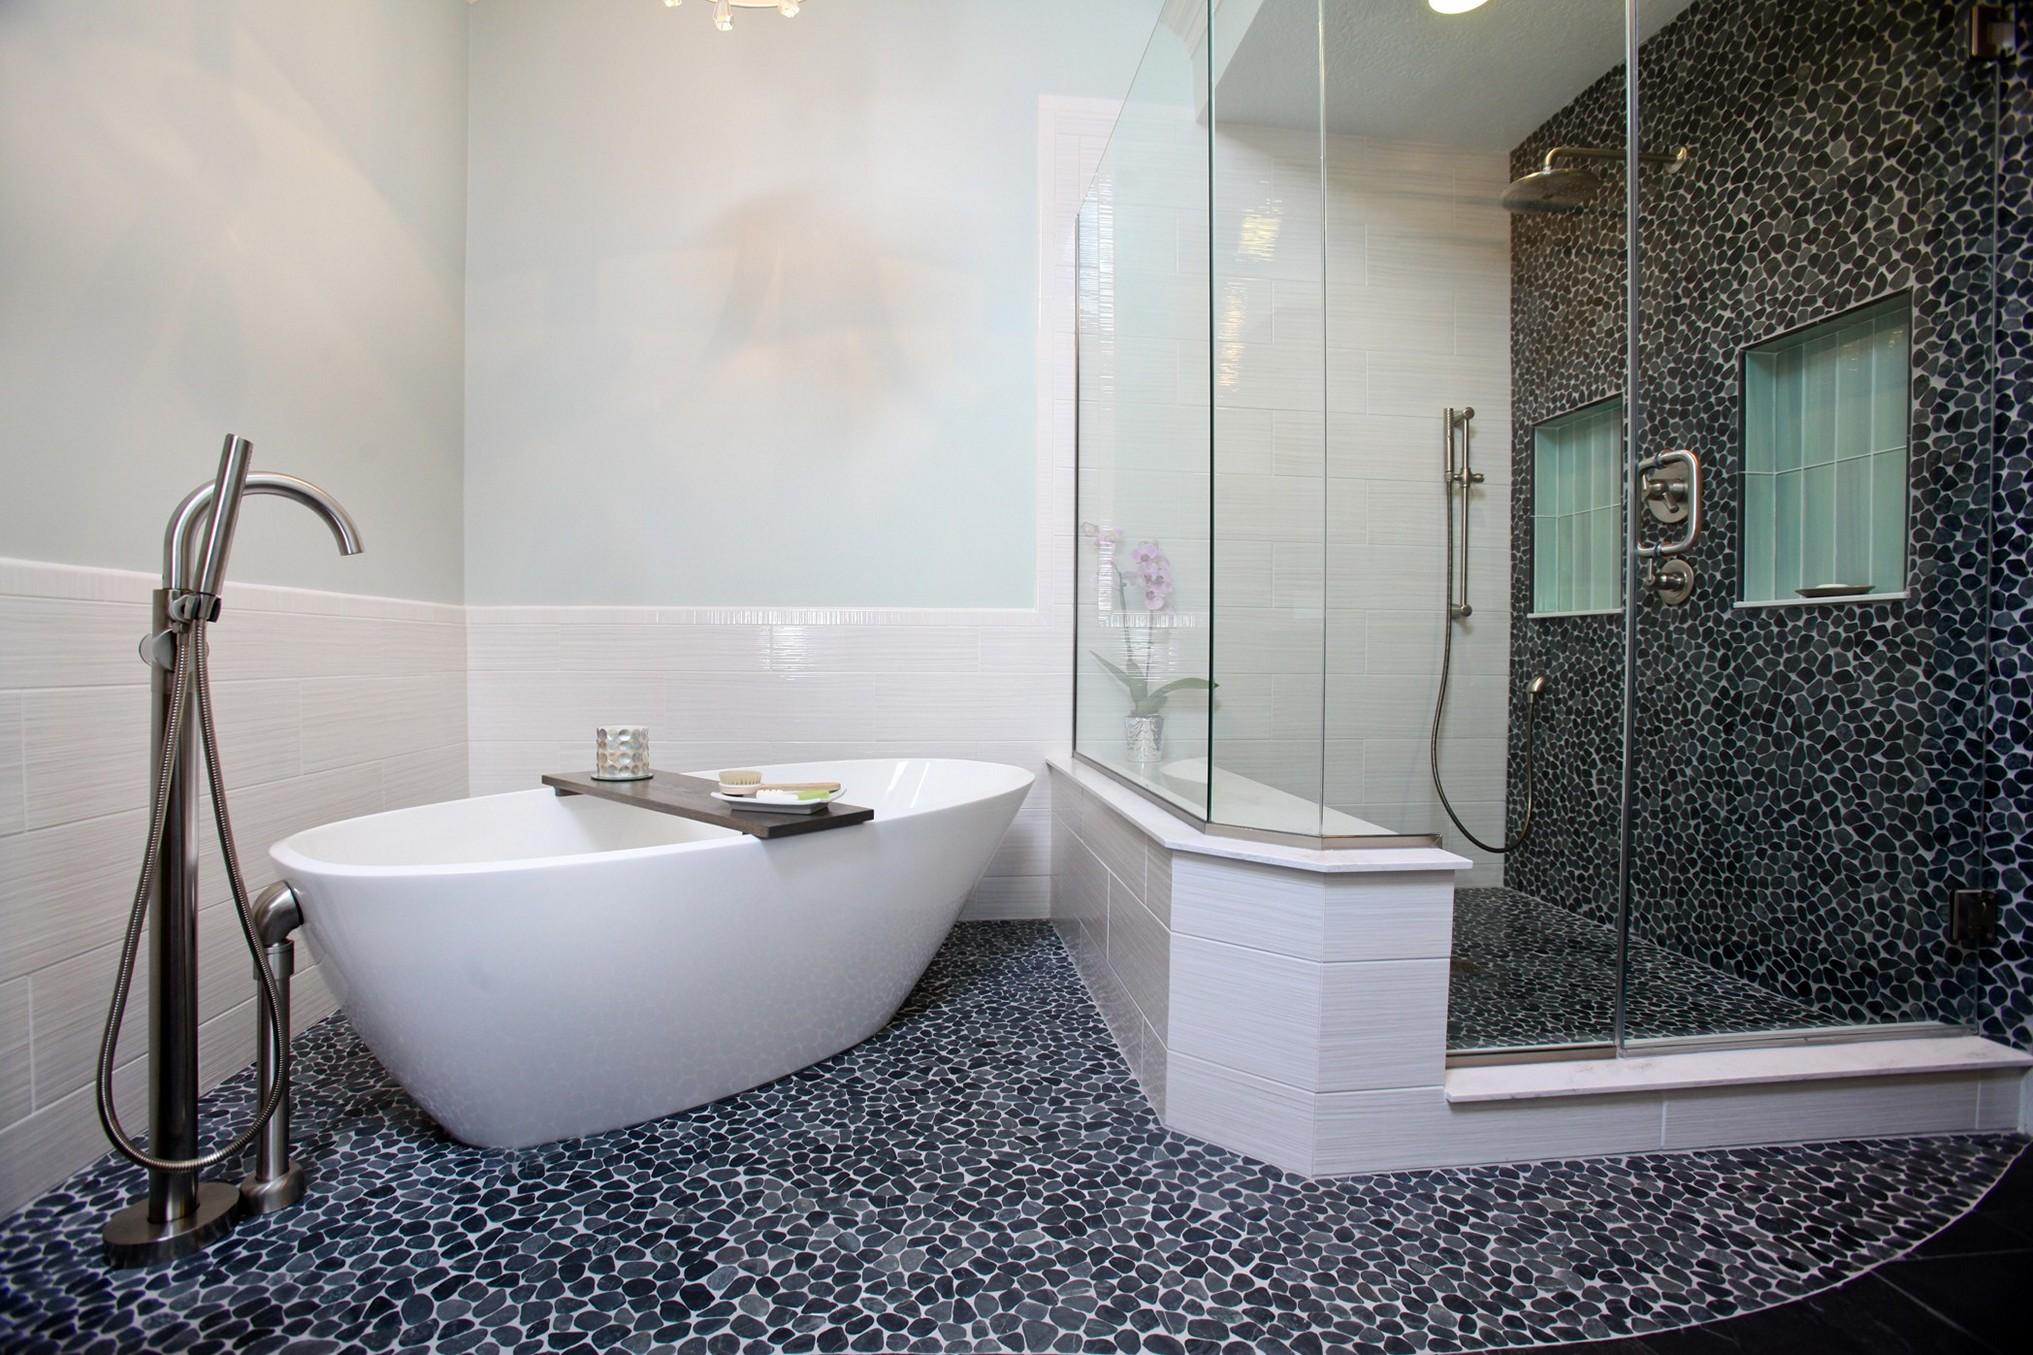 Bathroom Wall Tile Designs Mesmerizing Bathroom Wall Tiles Design Ideas